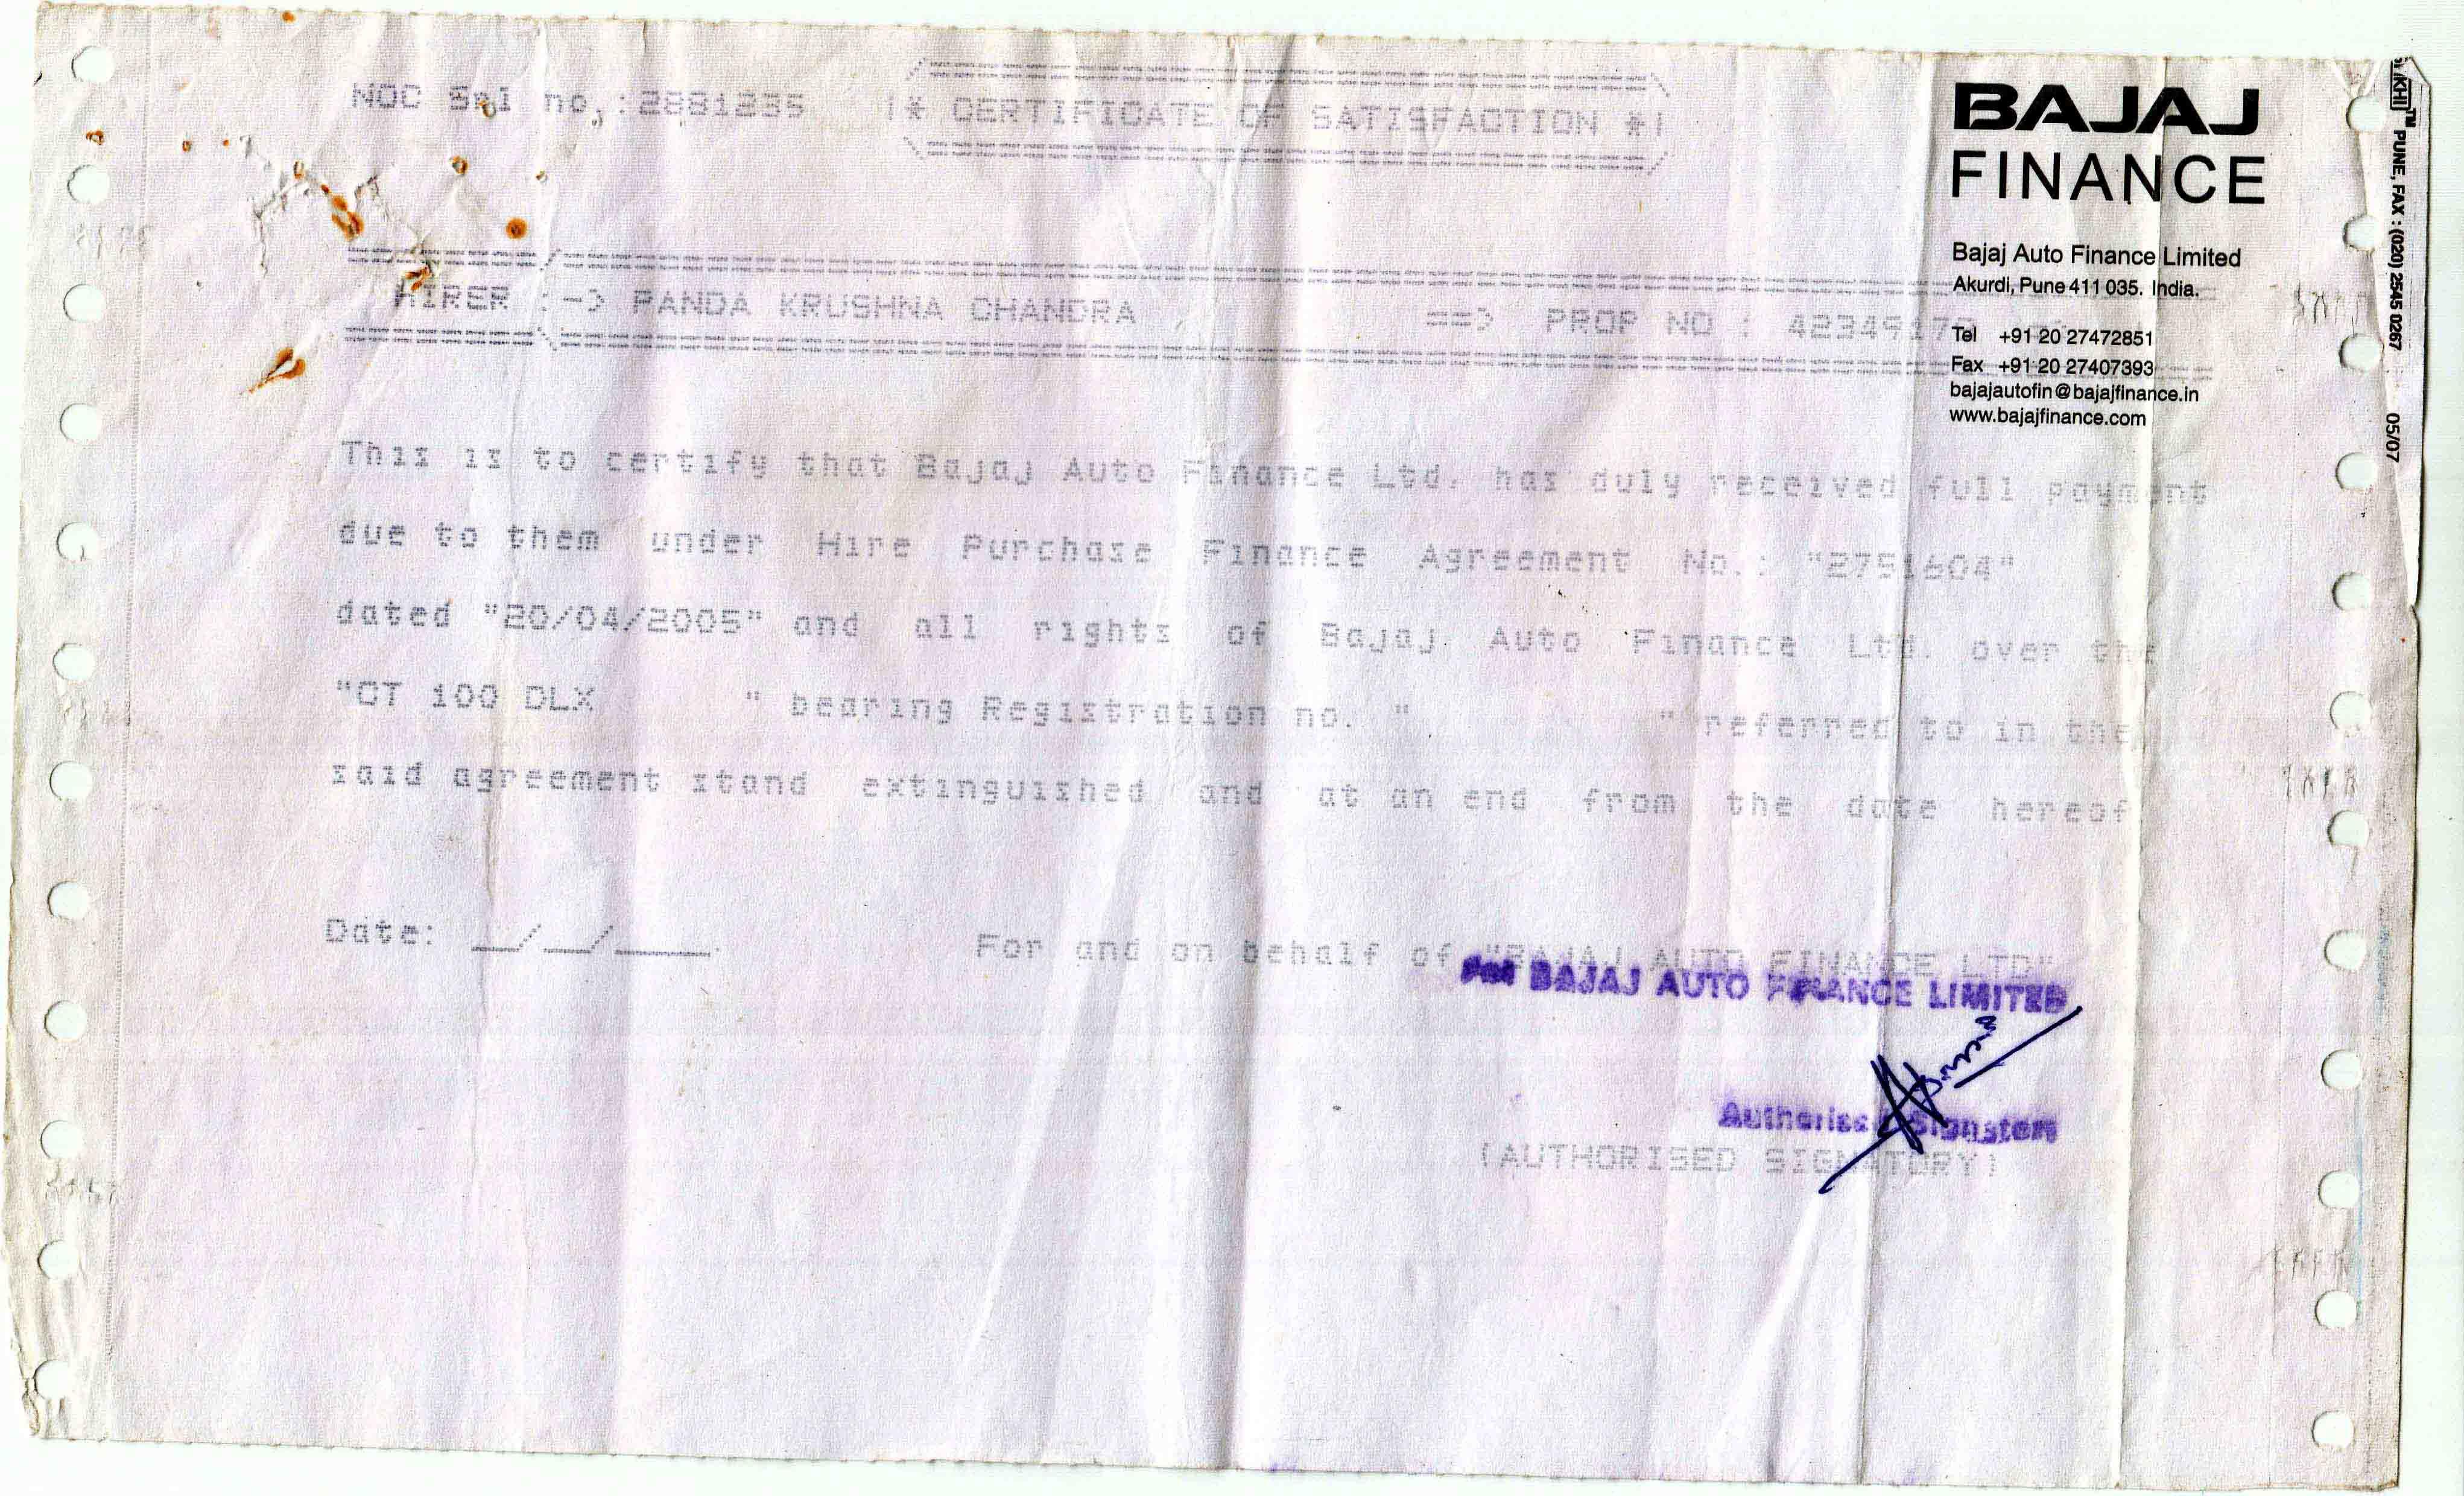 Bajaj auto finance is very dangerous bajaj auto finance limited ive attached my all clearance certificates indias biggest auto finance is bajaj finance yadclub Choice Image